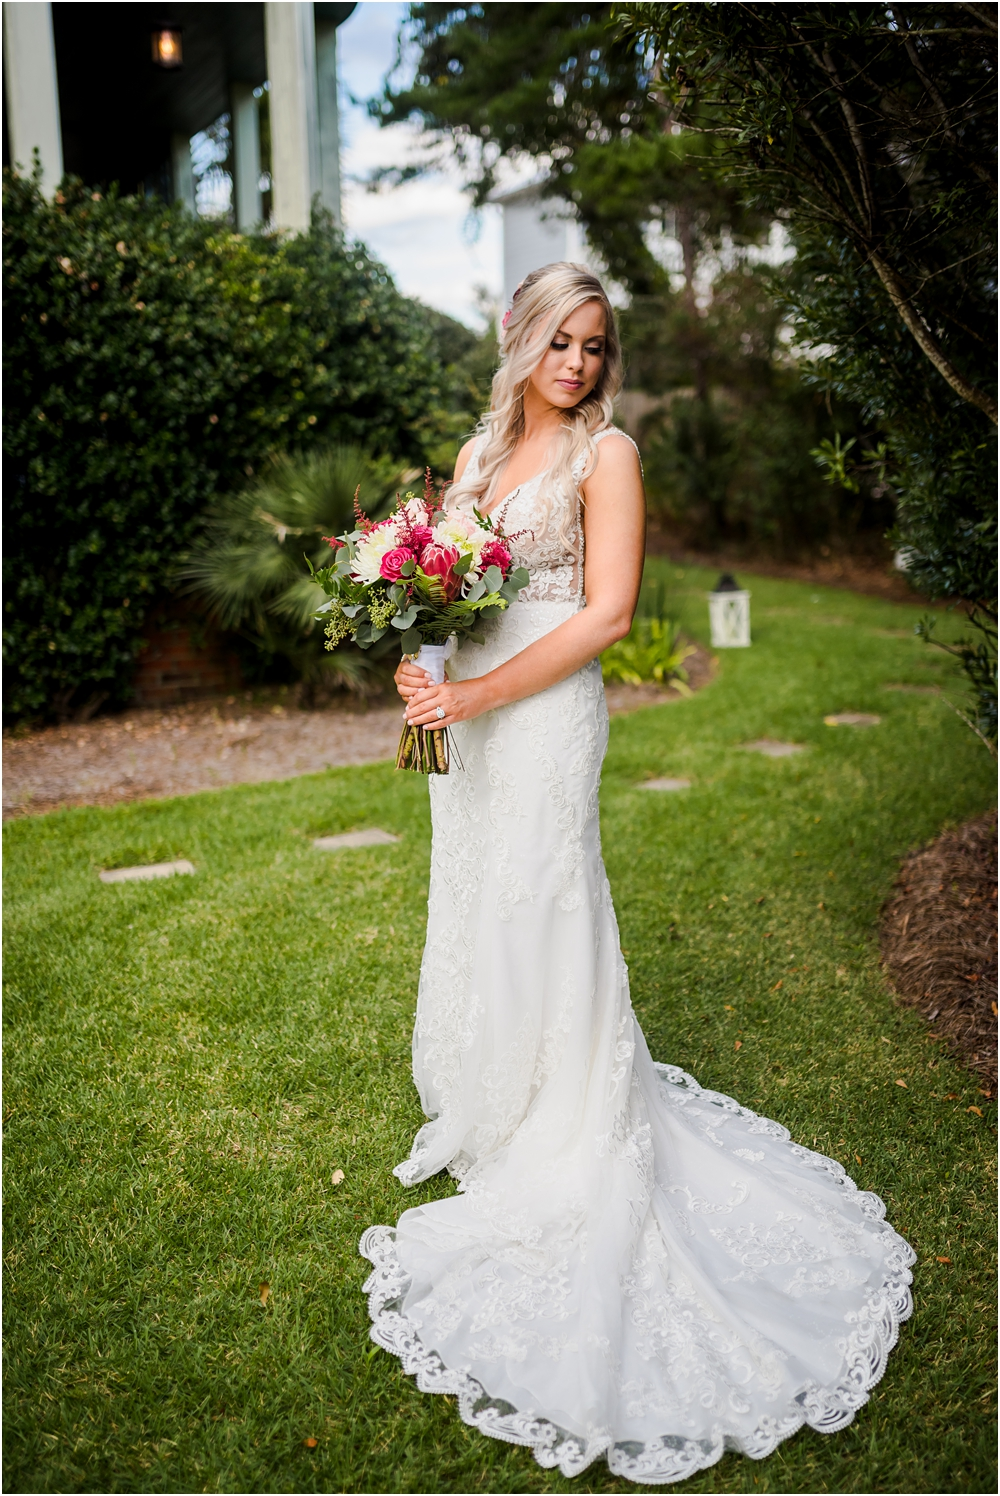 mcglothlin-wedding-kiersten-stevenson-photography-30a-panama-city-beach-dothan-tallahassee-(65-of-145).jpg